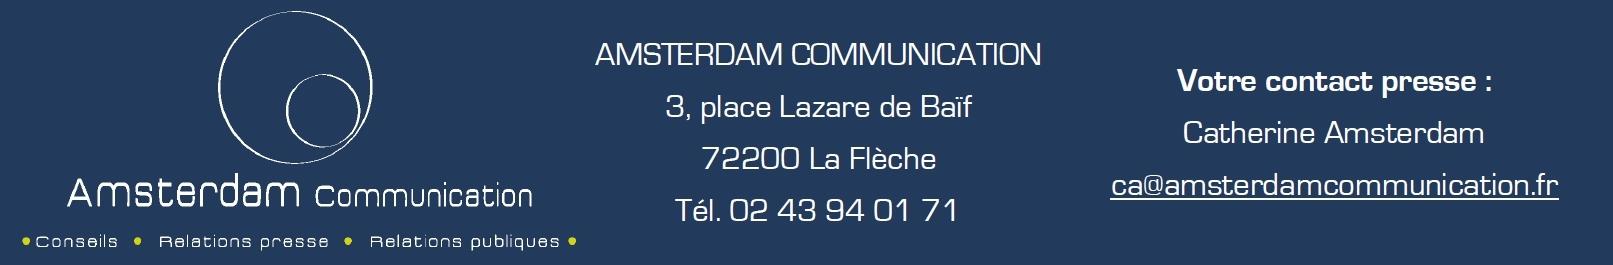 Votre contact : Catherine Amsterdam